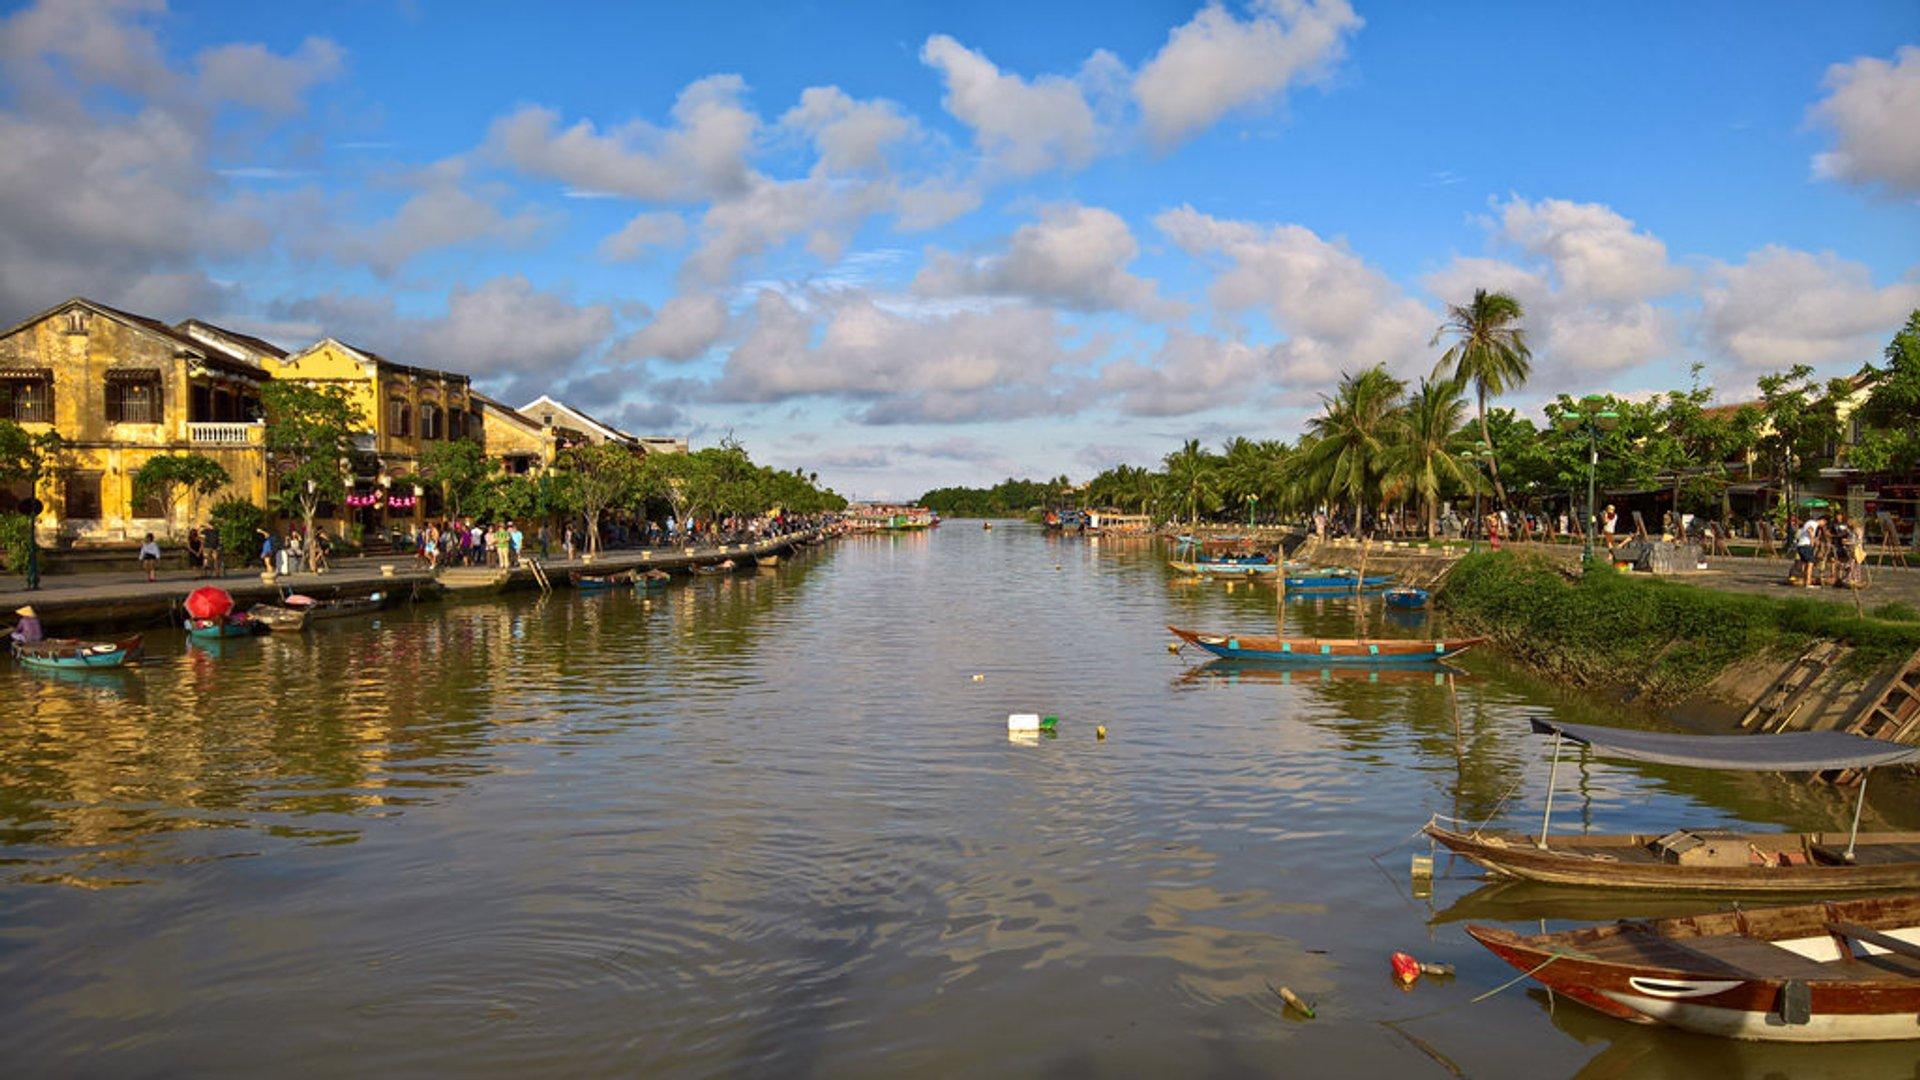 Central Vietnam Dry Season in Vietnam - Best Season 2020